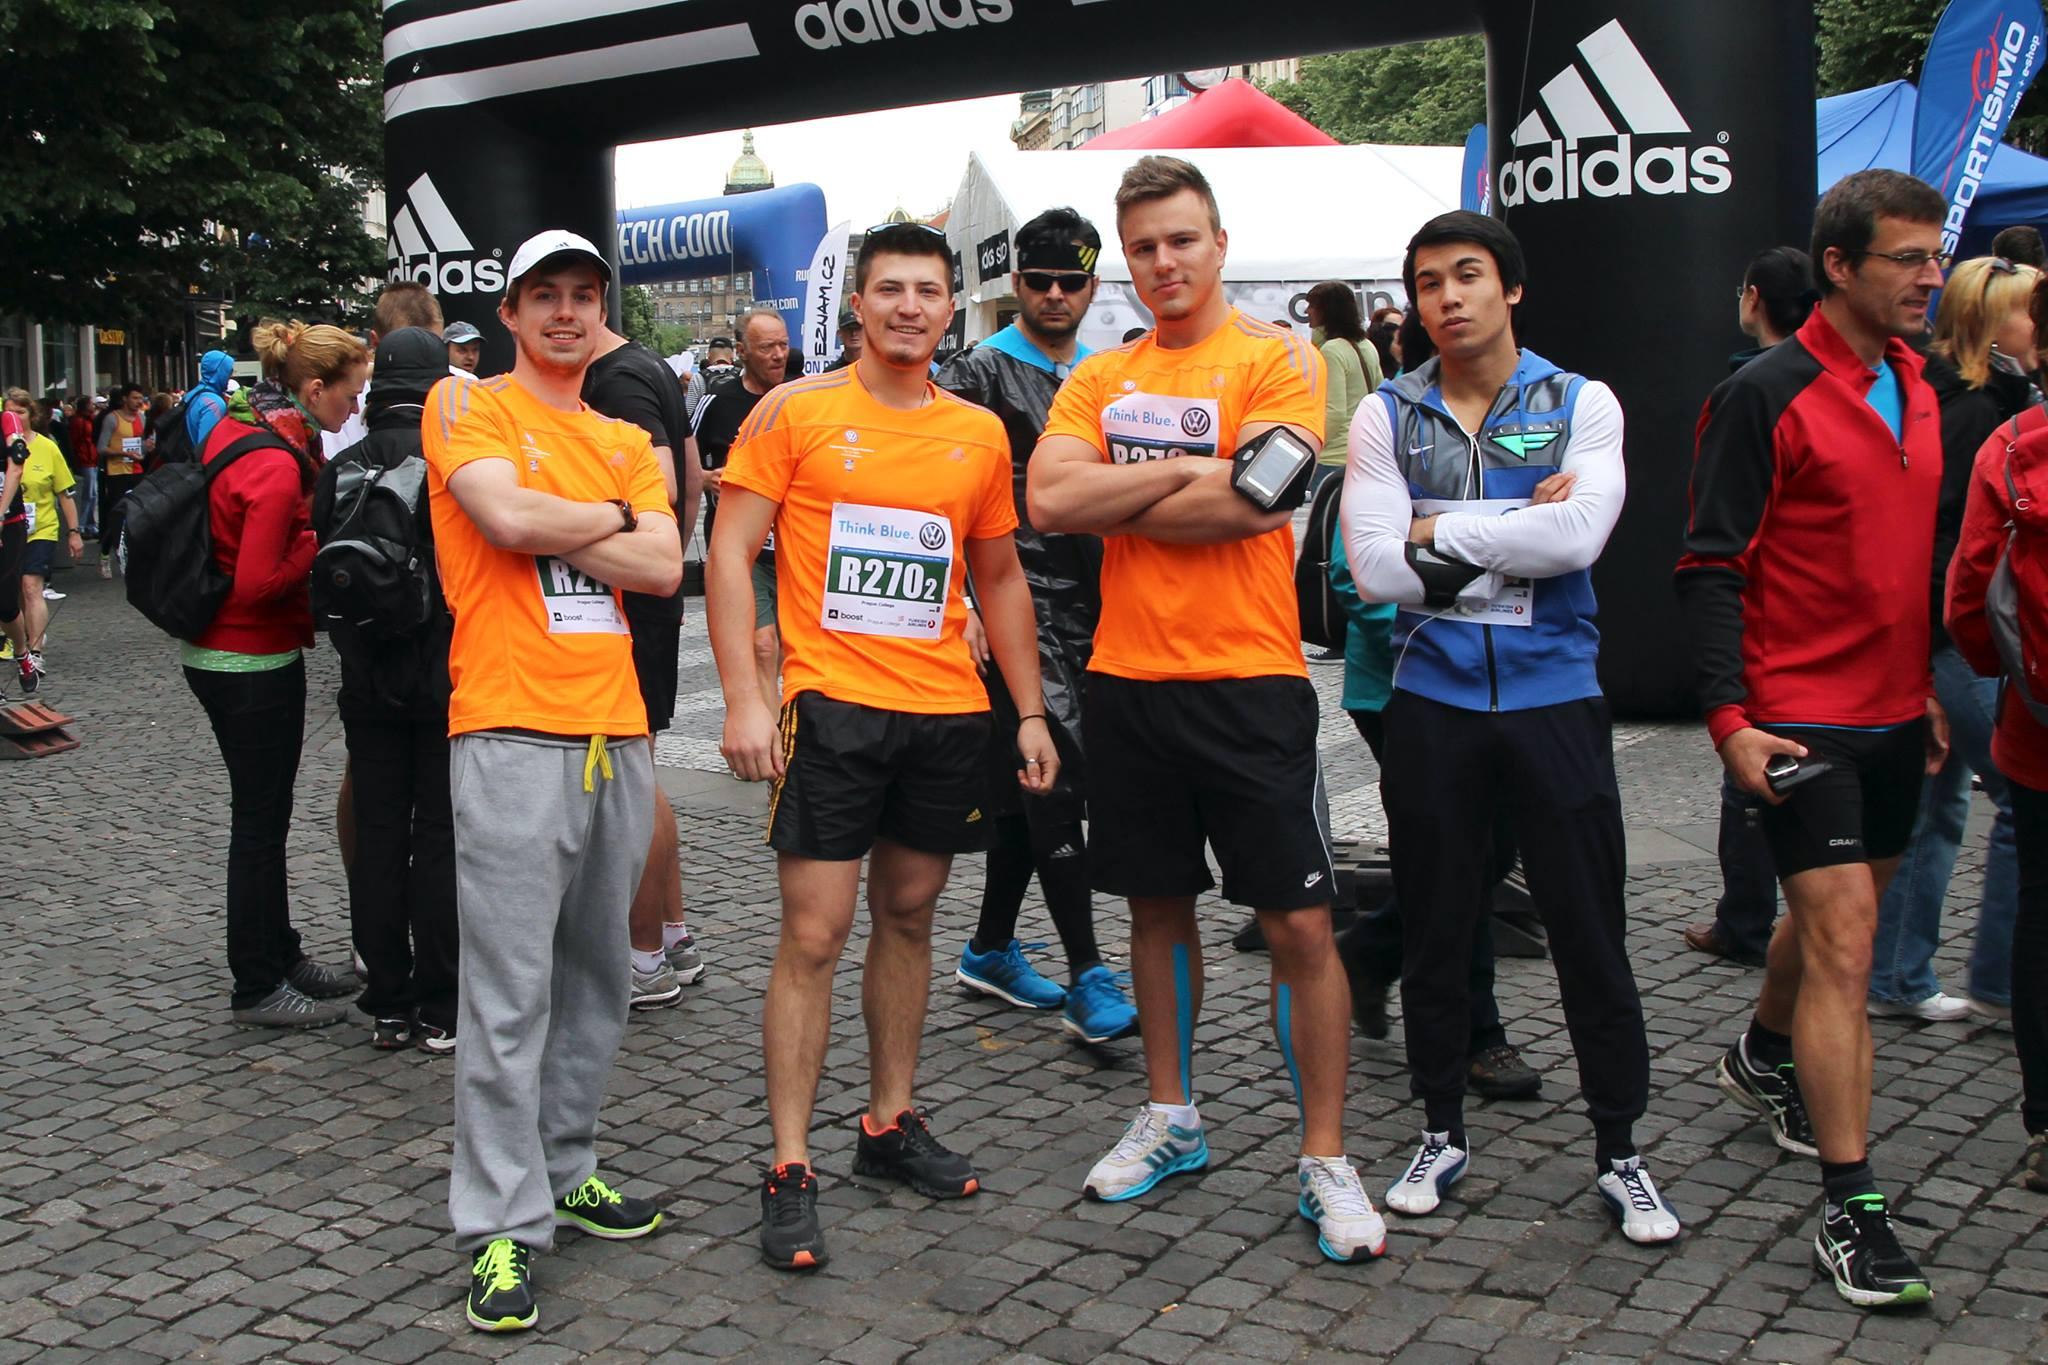 Congratulations to our Marathon team!